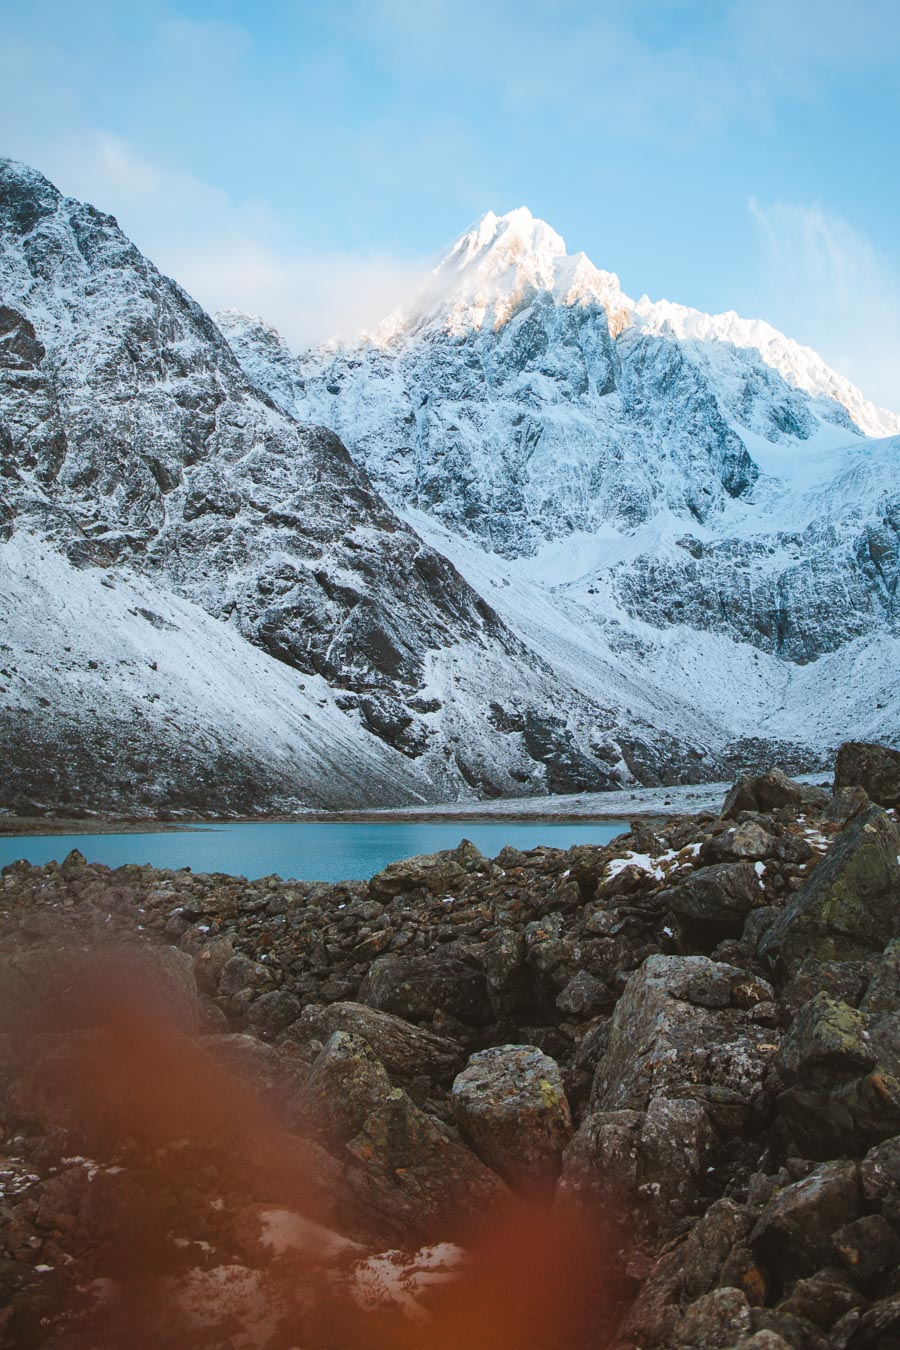 White mountains and blue lake